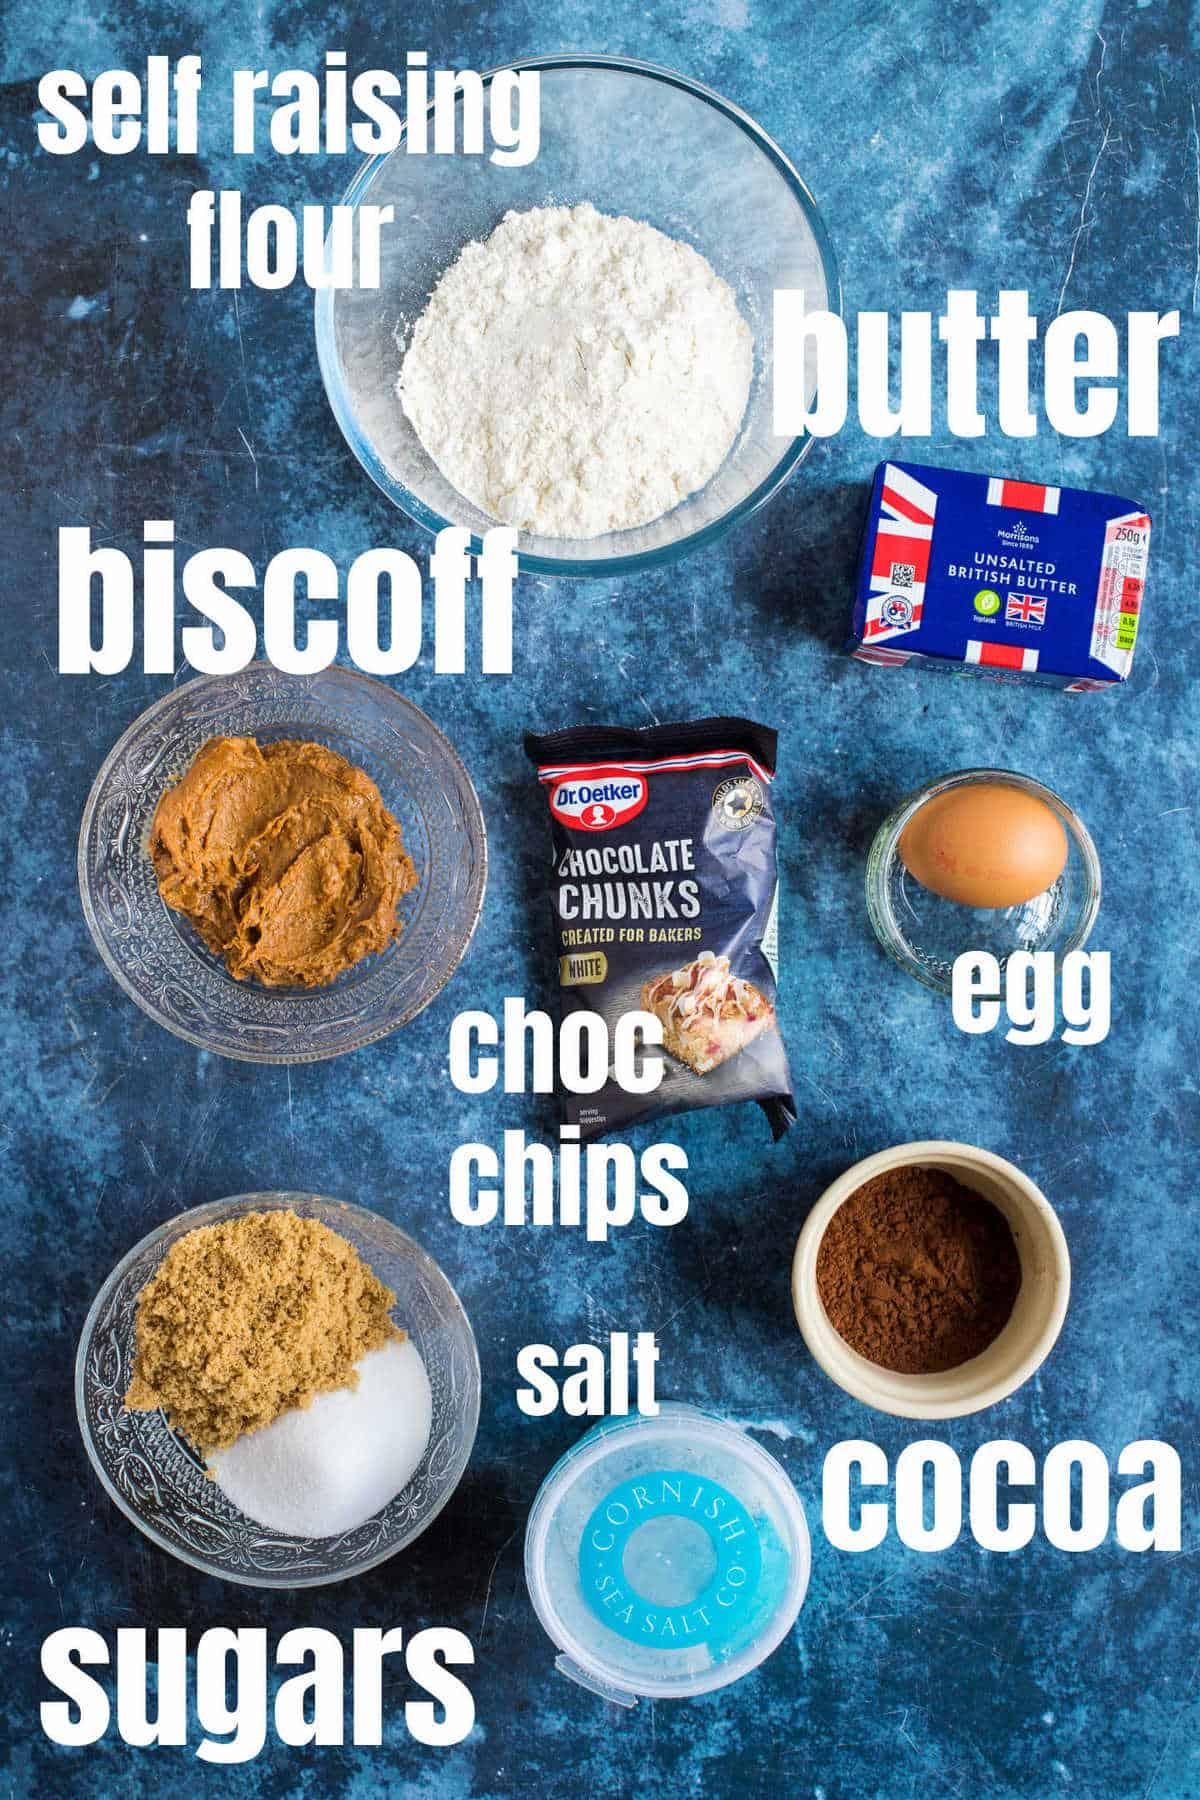 Ingredients needed for chocolate biscoff cookies.